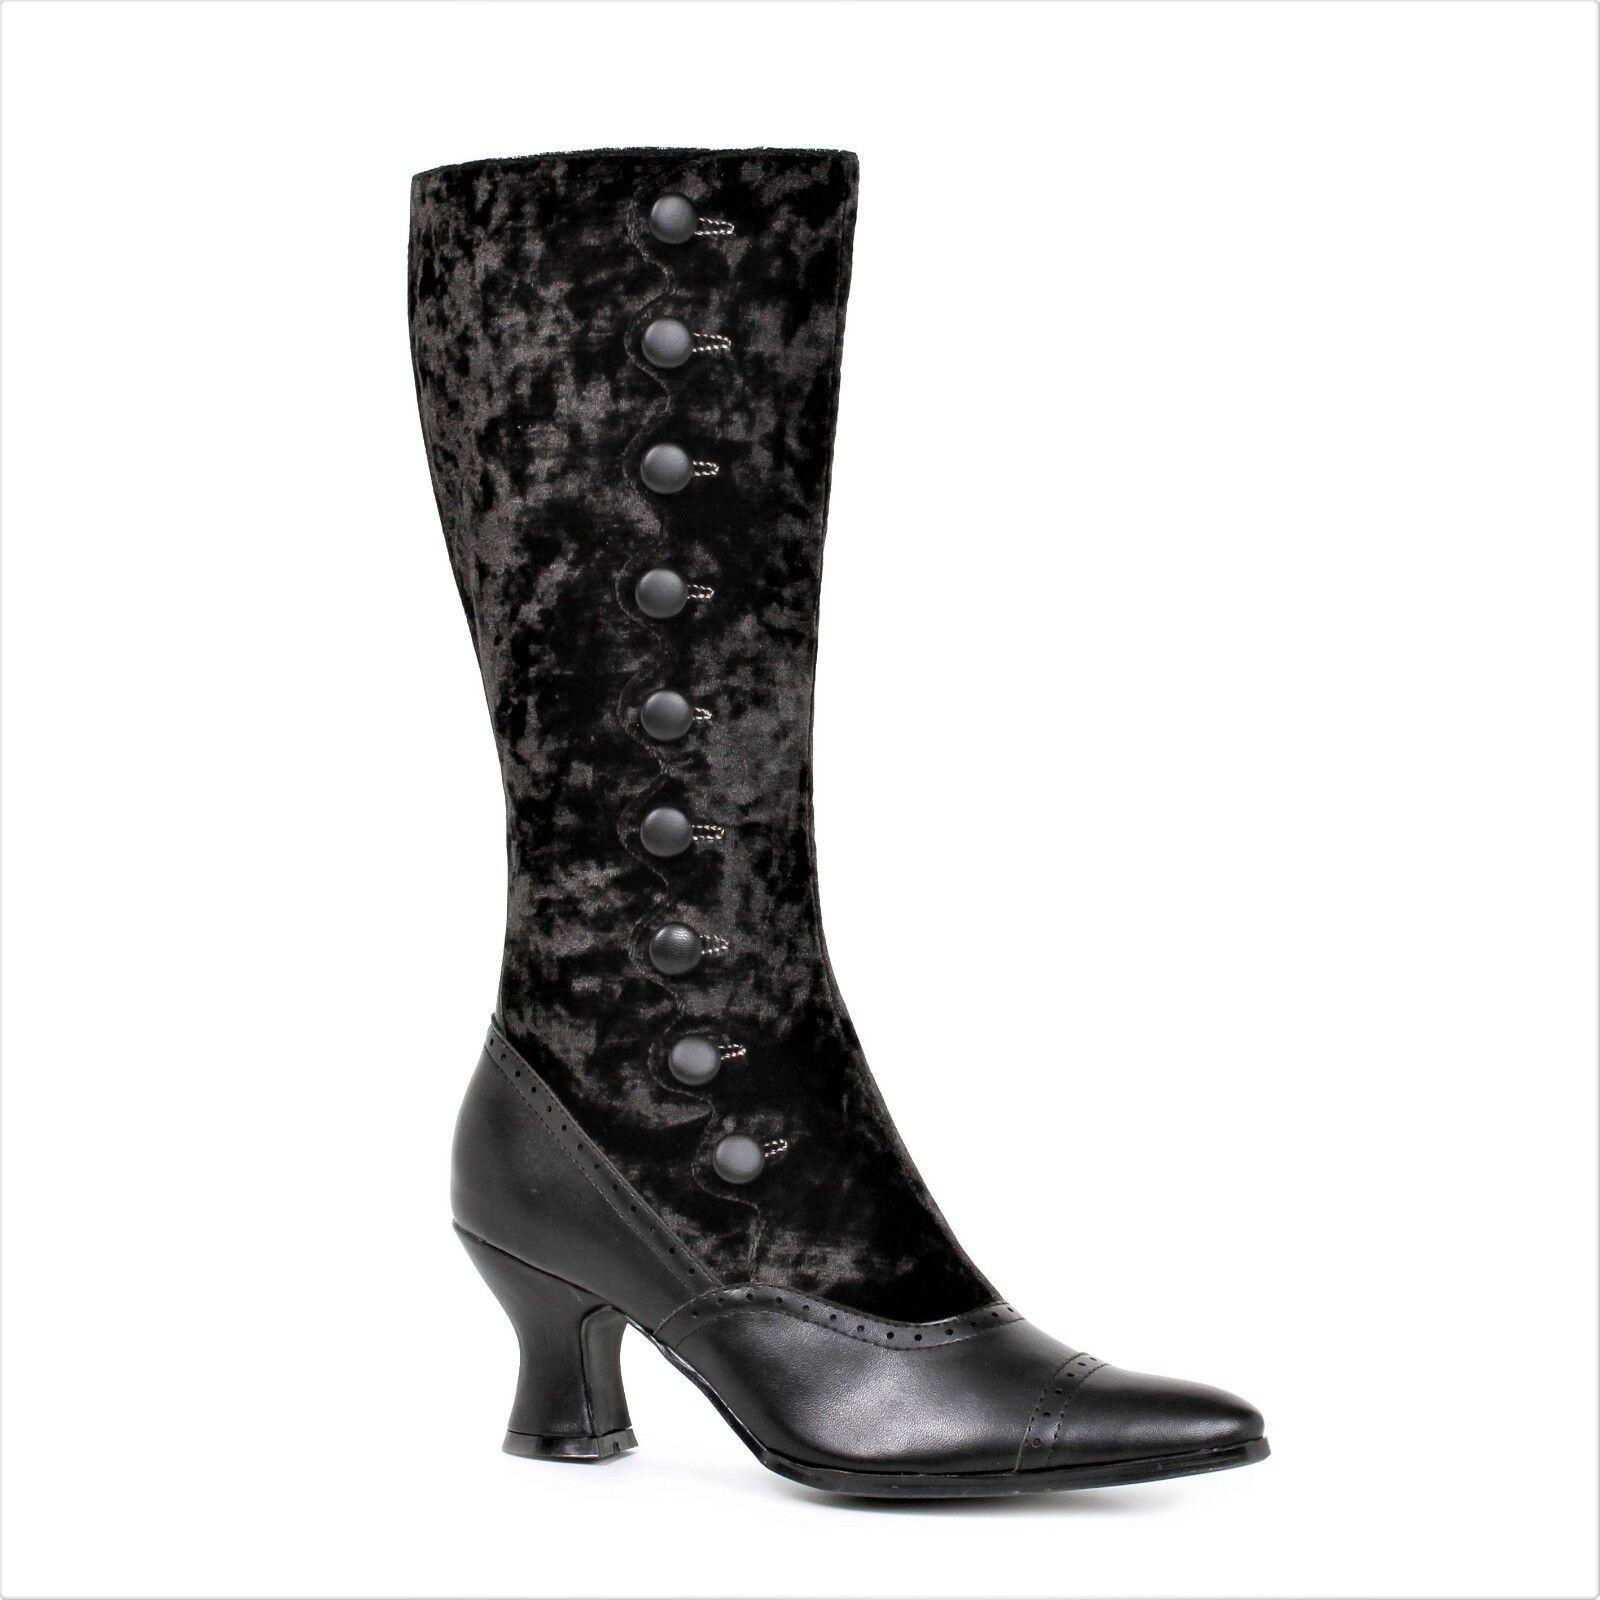 Black Velvet Steampunk Saloon Girl Western Cowboy Halloween Costume Boots 7 8 9